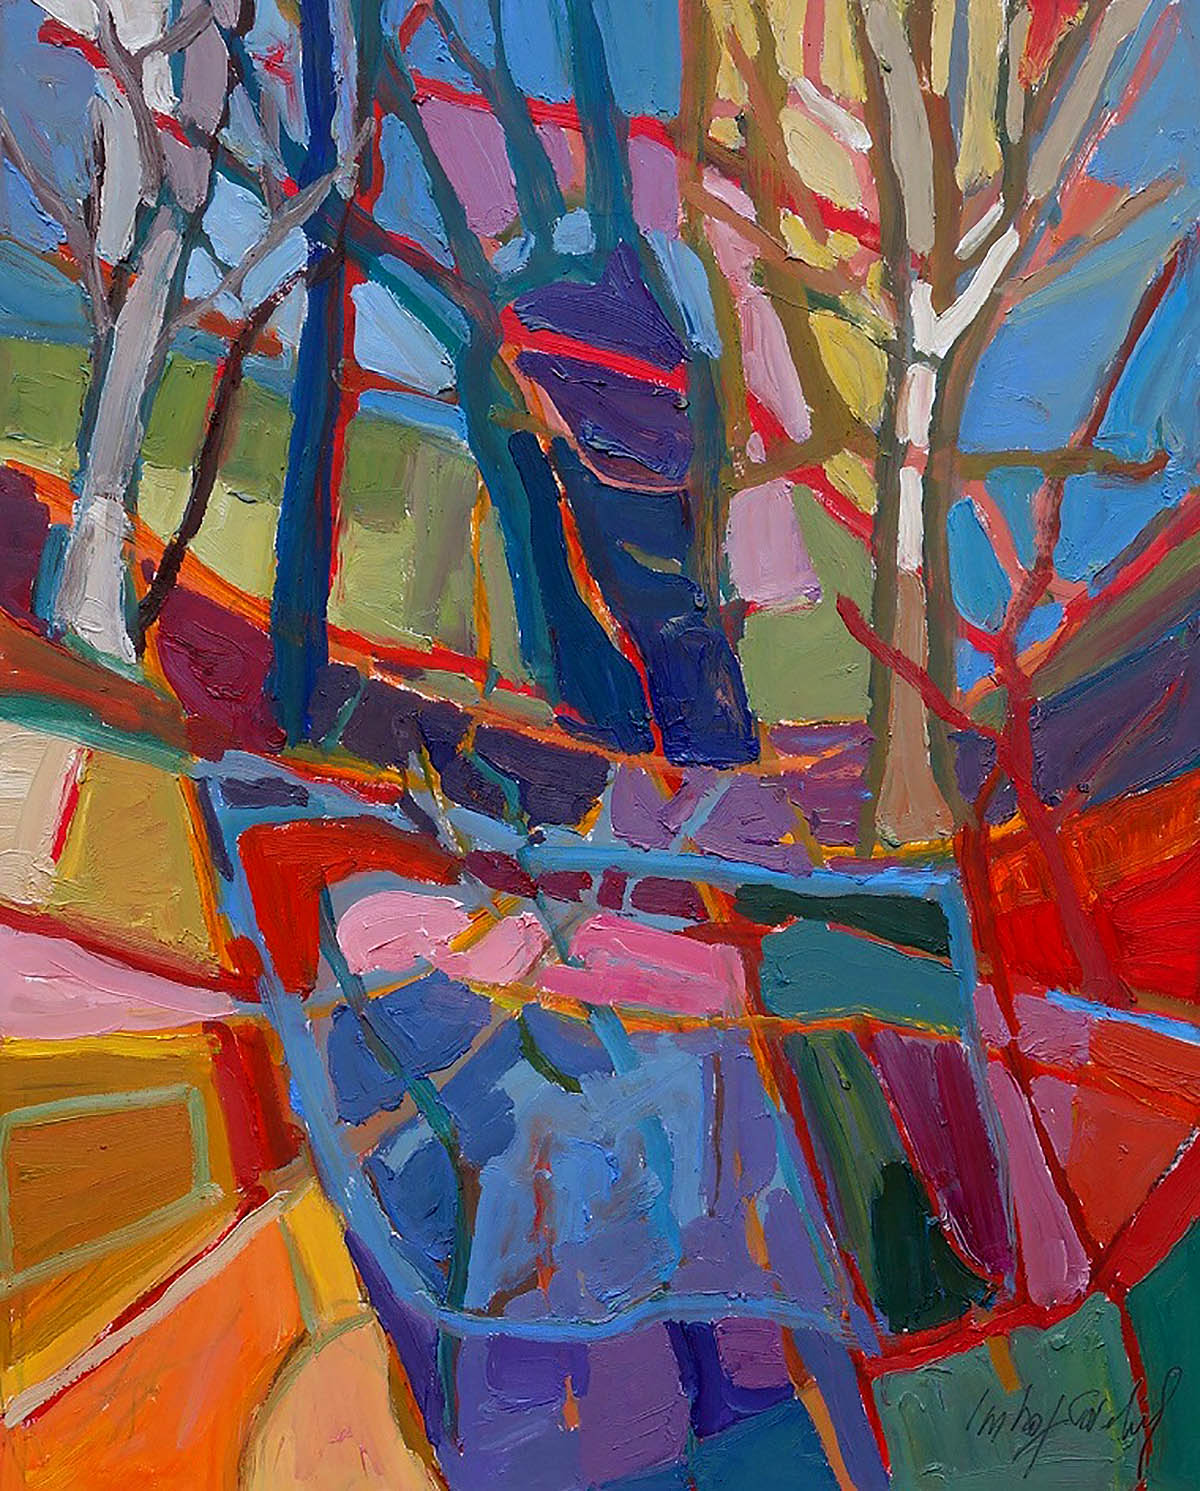 Catherine Imhof Cardinal, 'Wald', oil